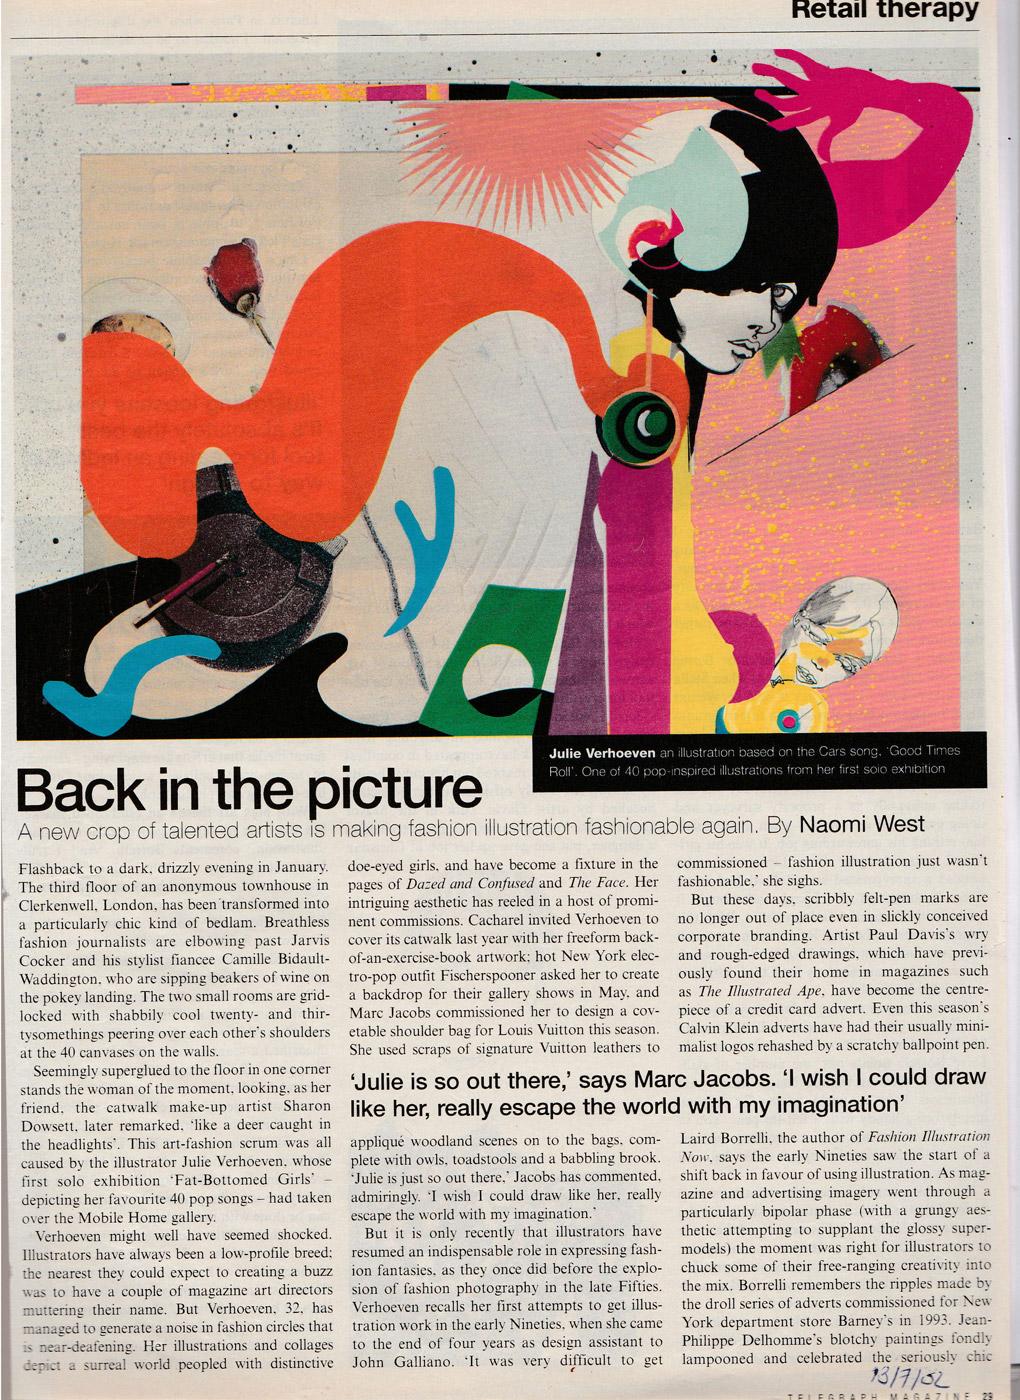 JulieVerhoeven_TelegraphMagazine2002